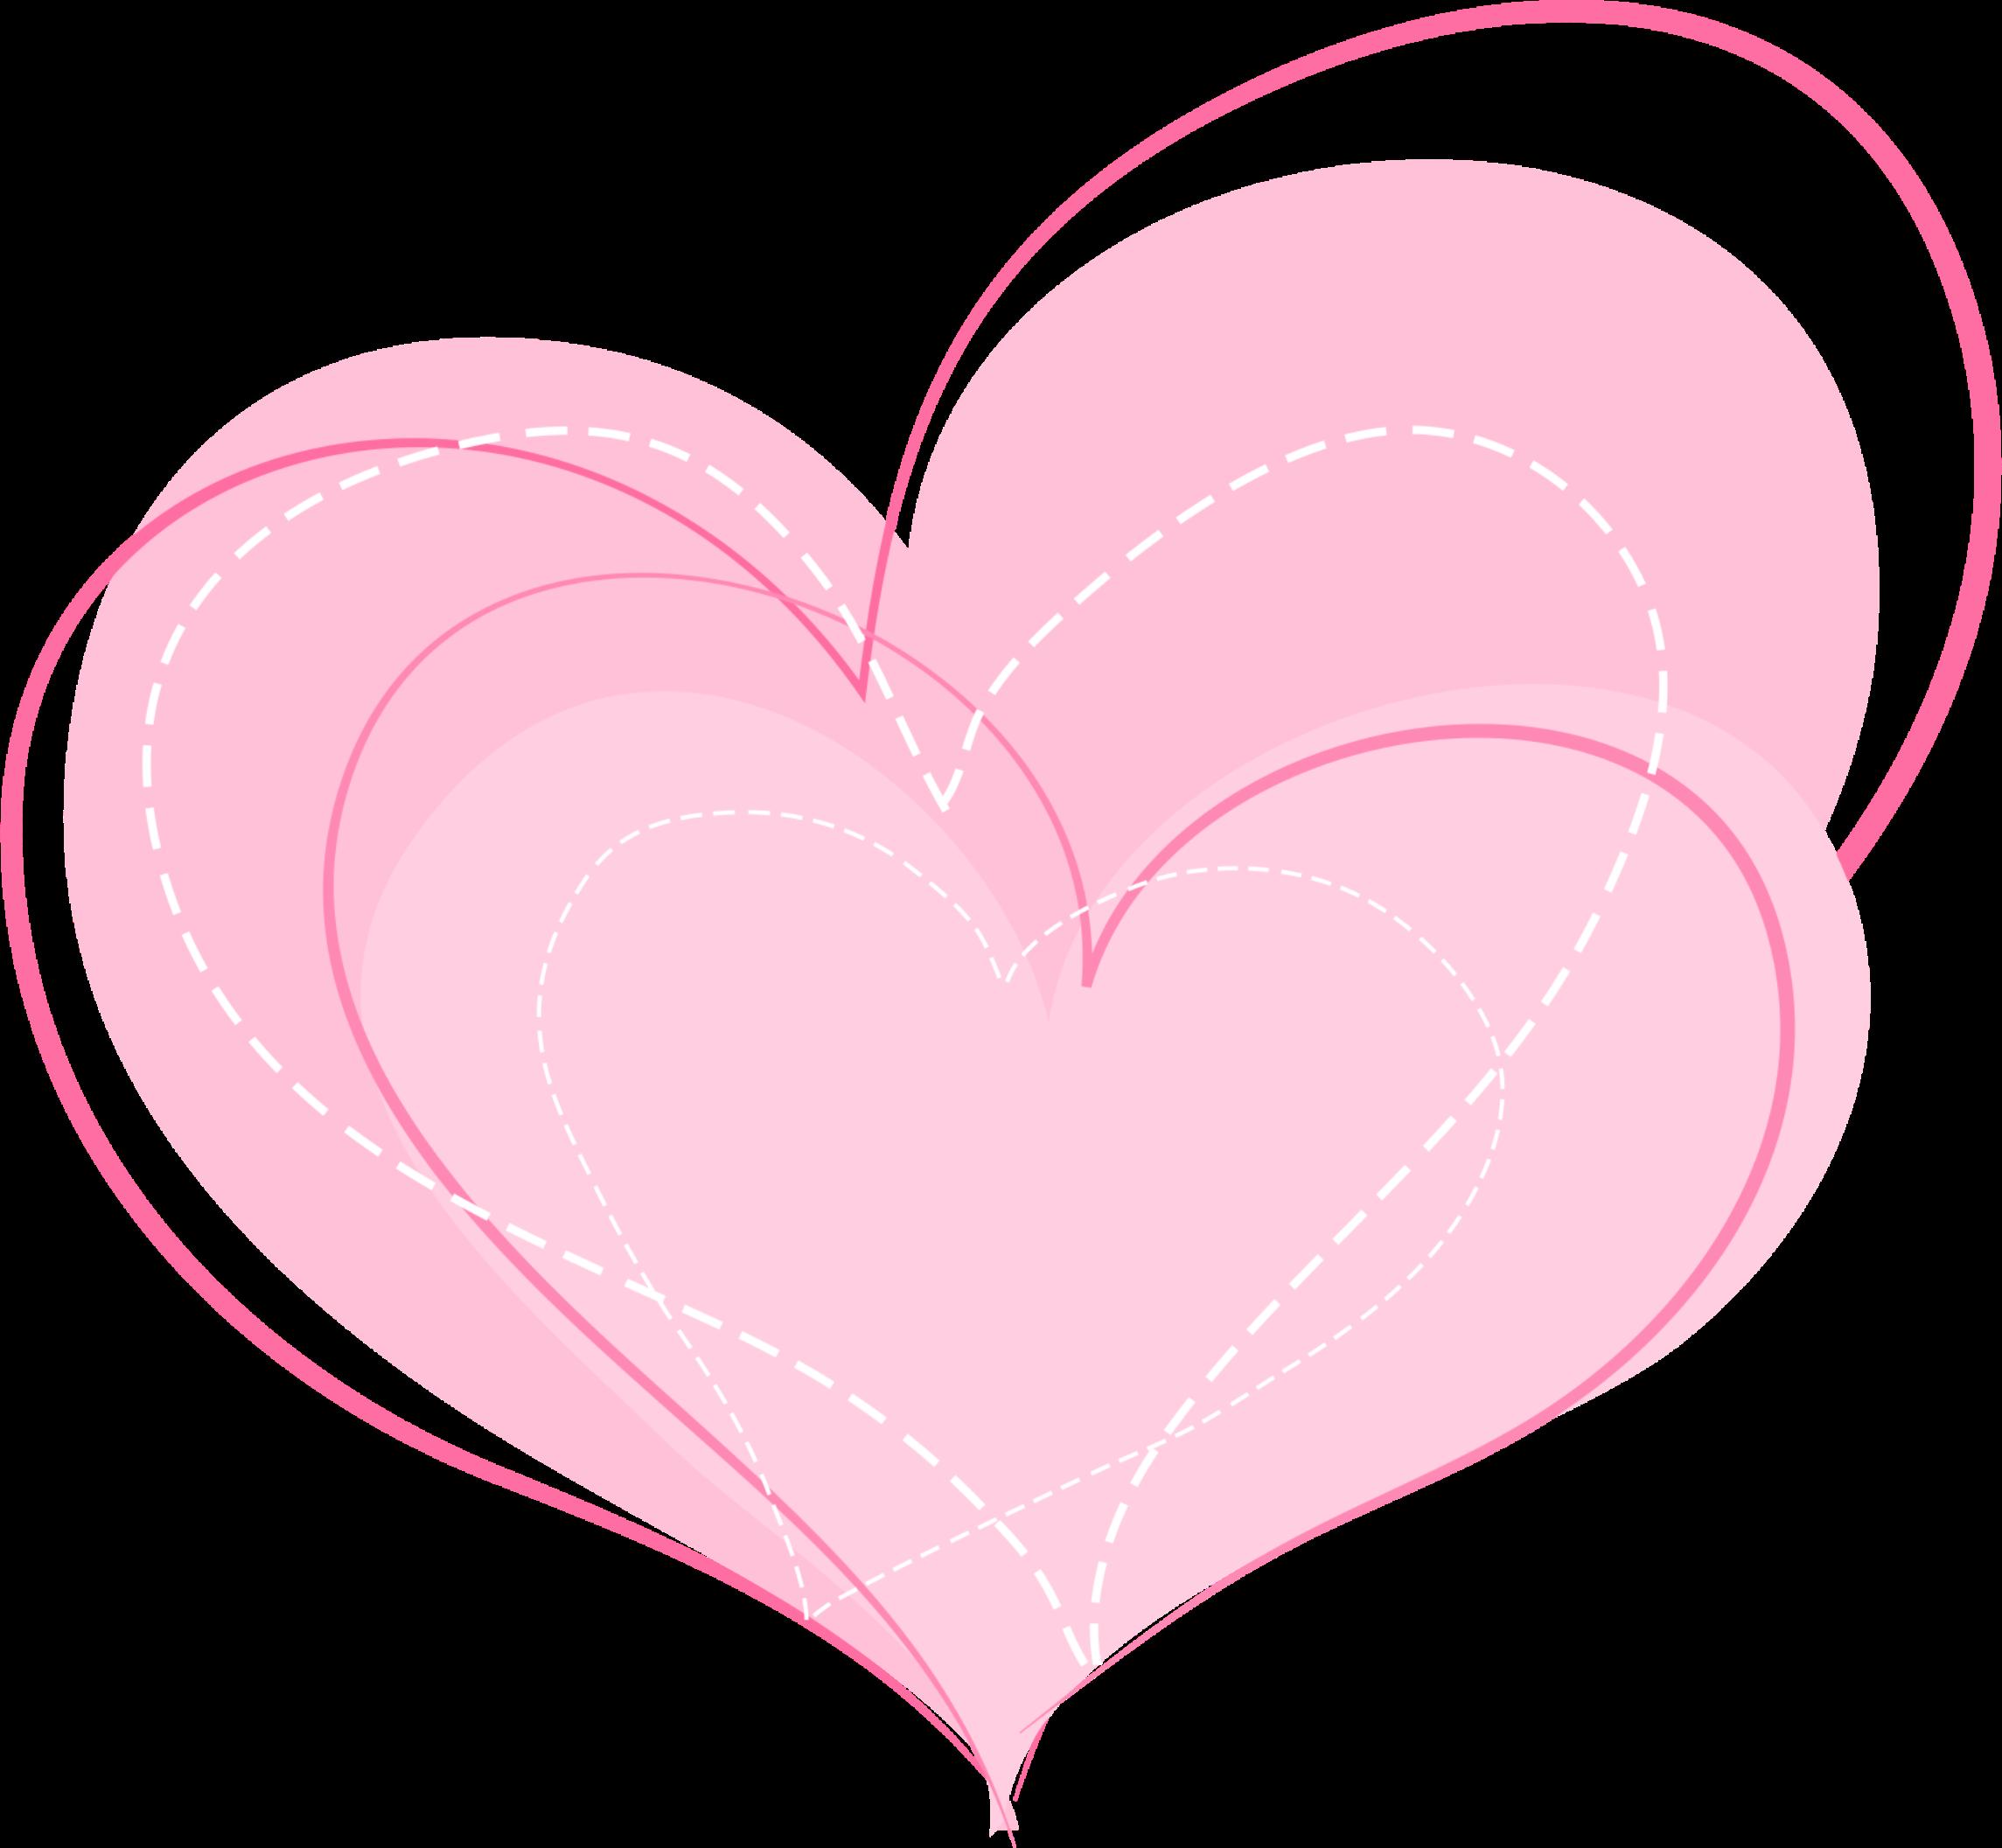 Картинки с сердечками розовыми